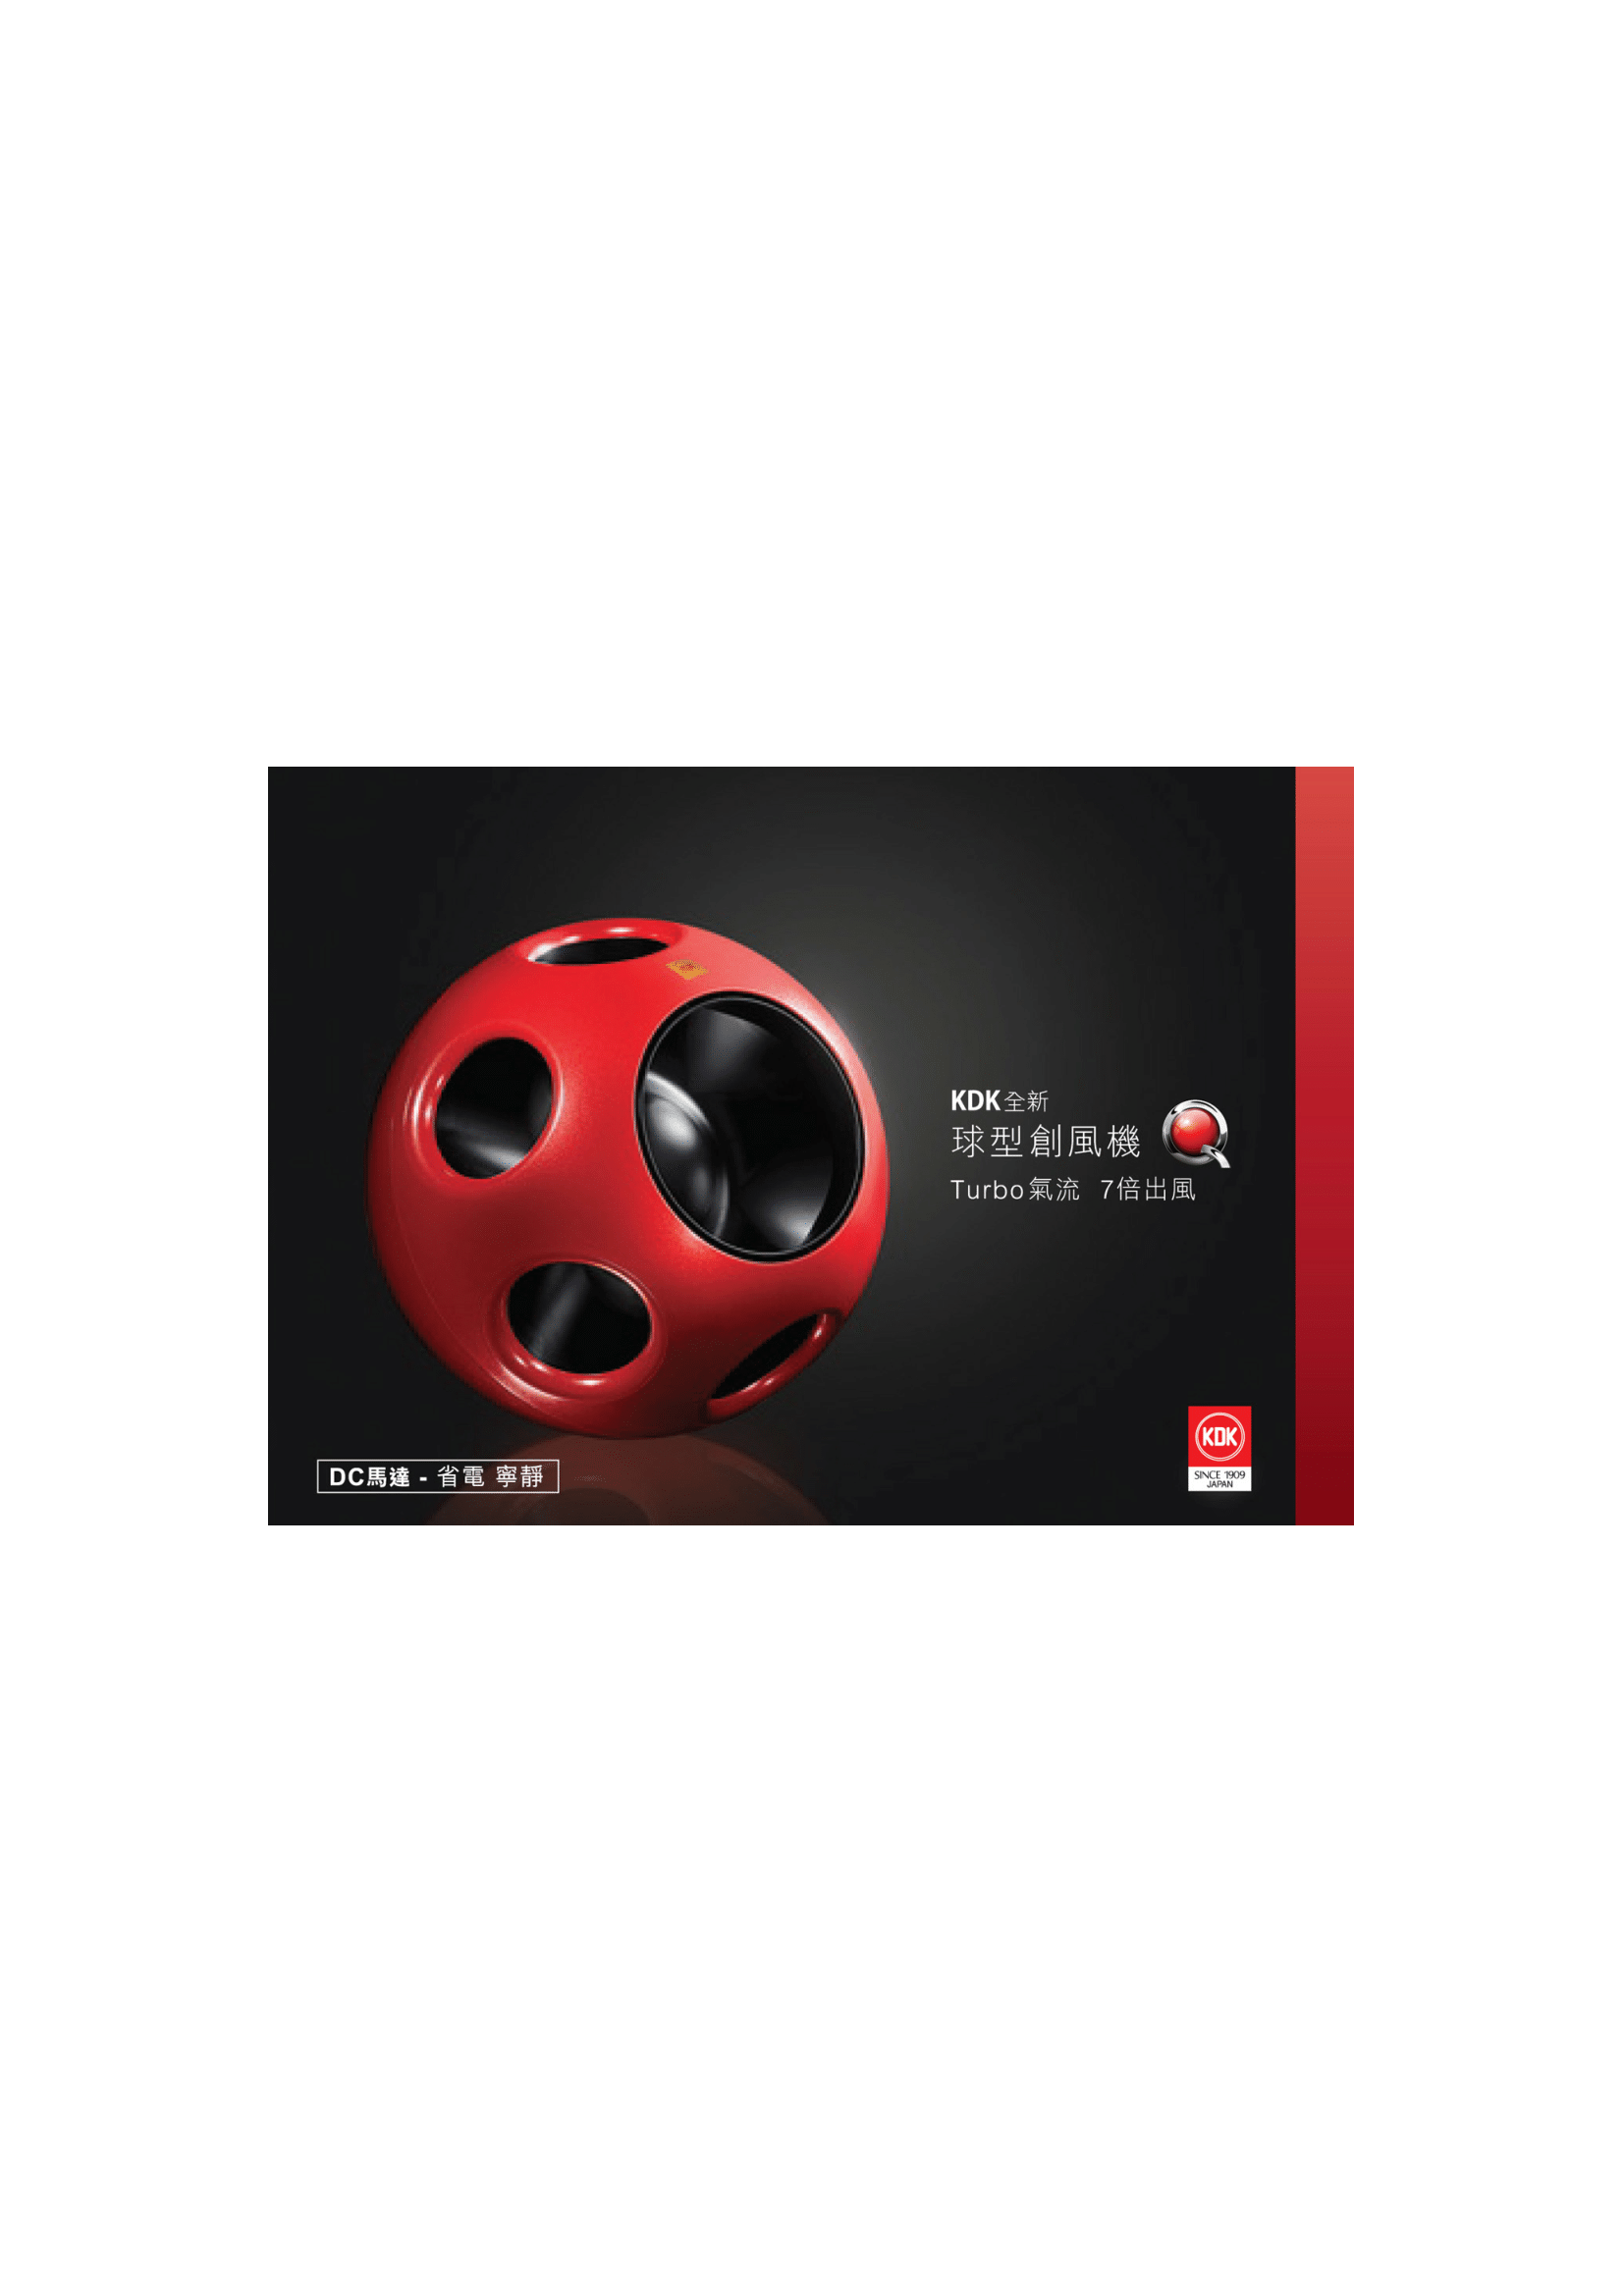 KDK Ball Fan Catalogue